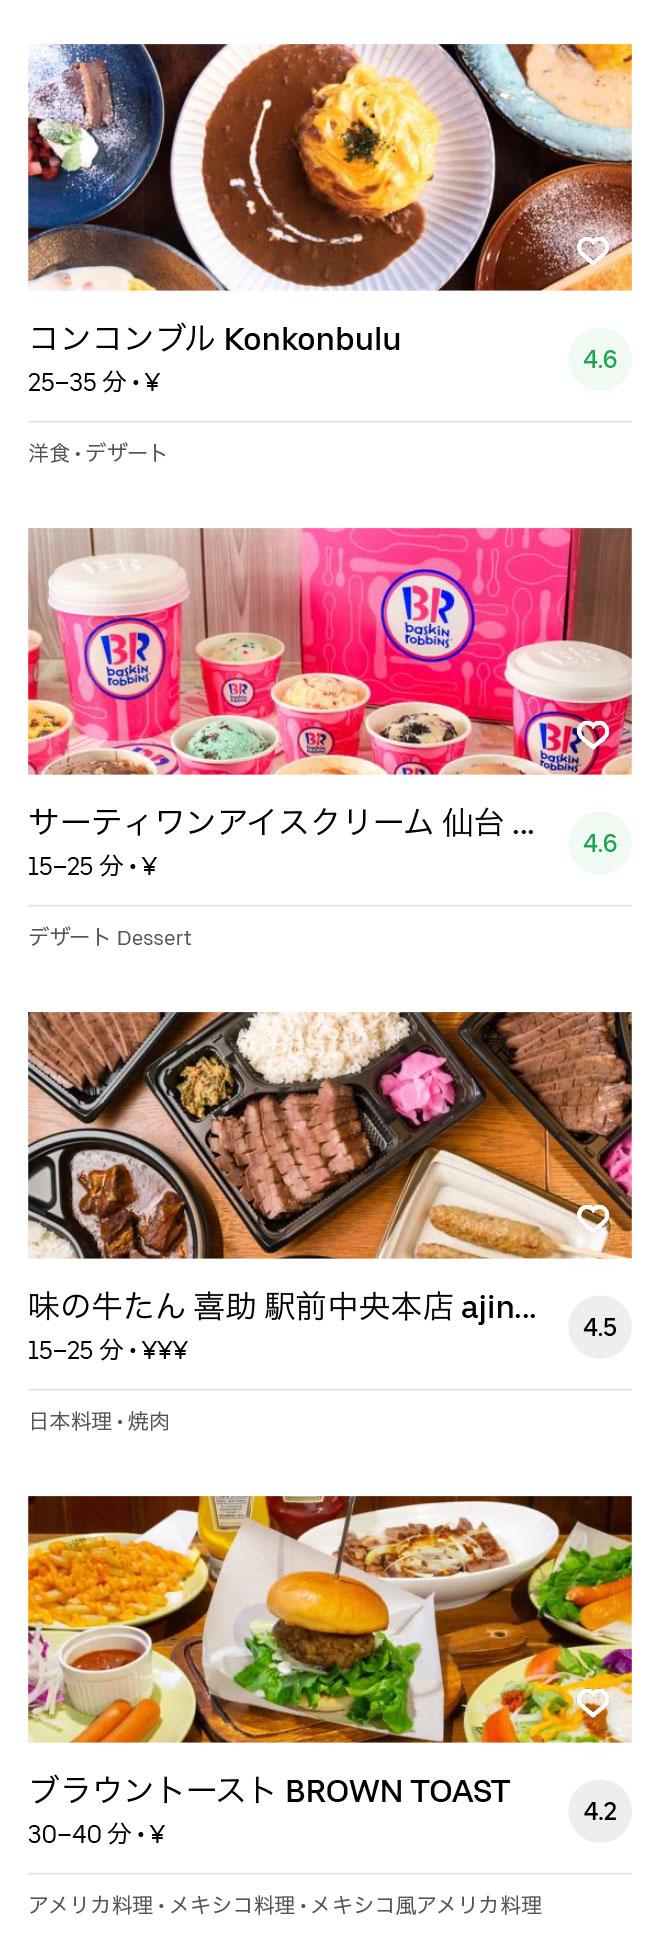 Sendai menu 200410